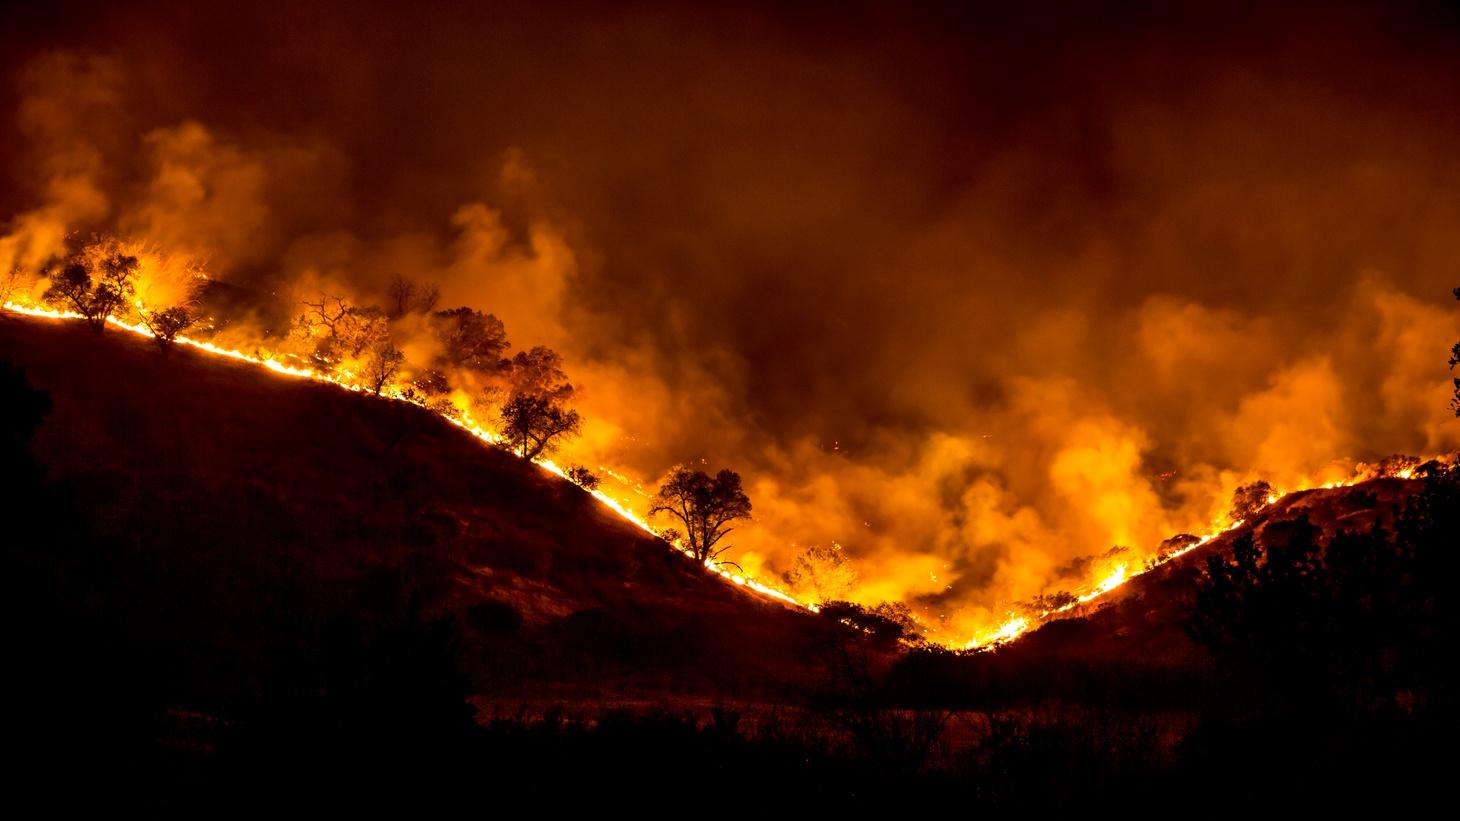 New Emergency Preparedness Procedures Necessary as California Wildfires Worsen